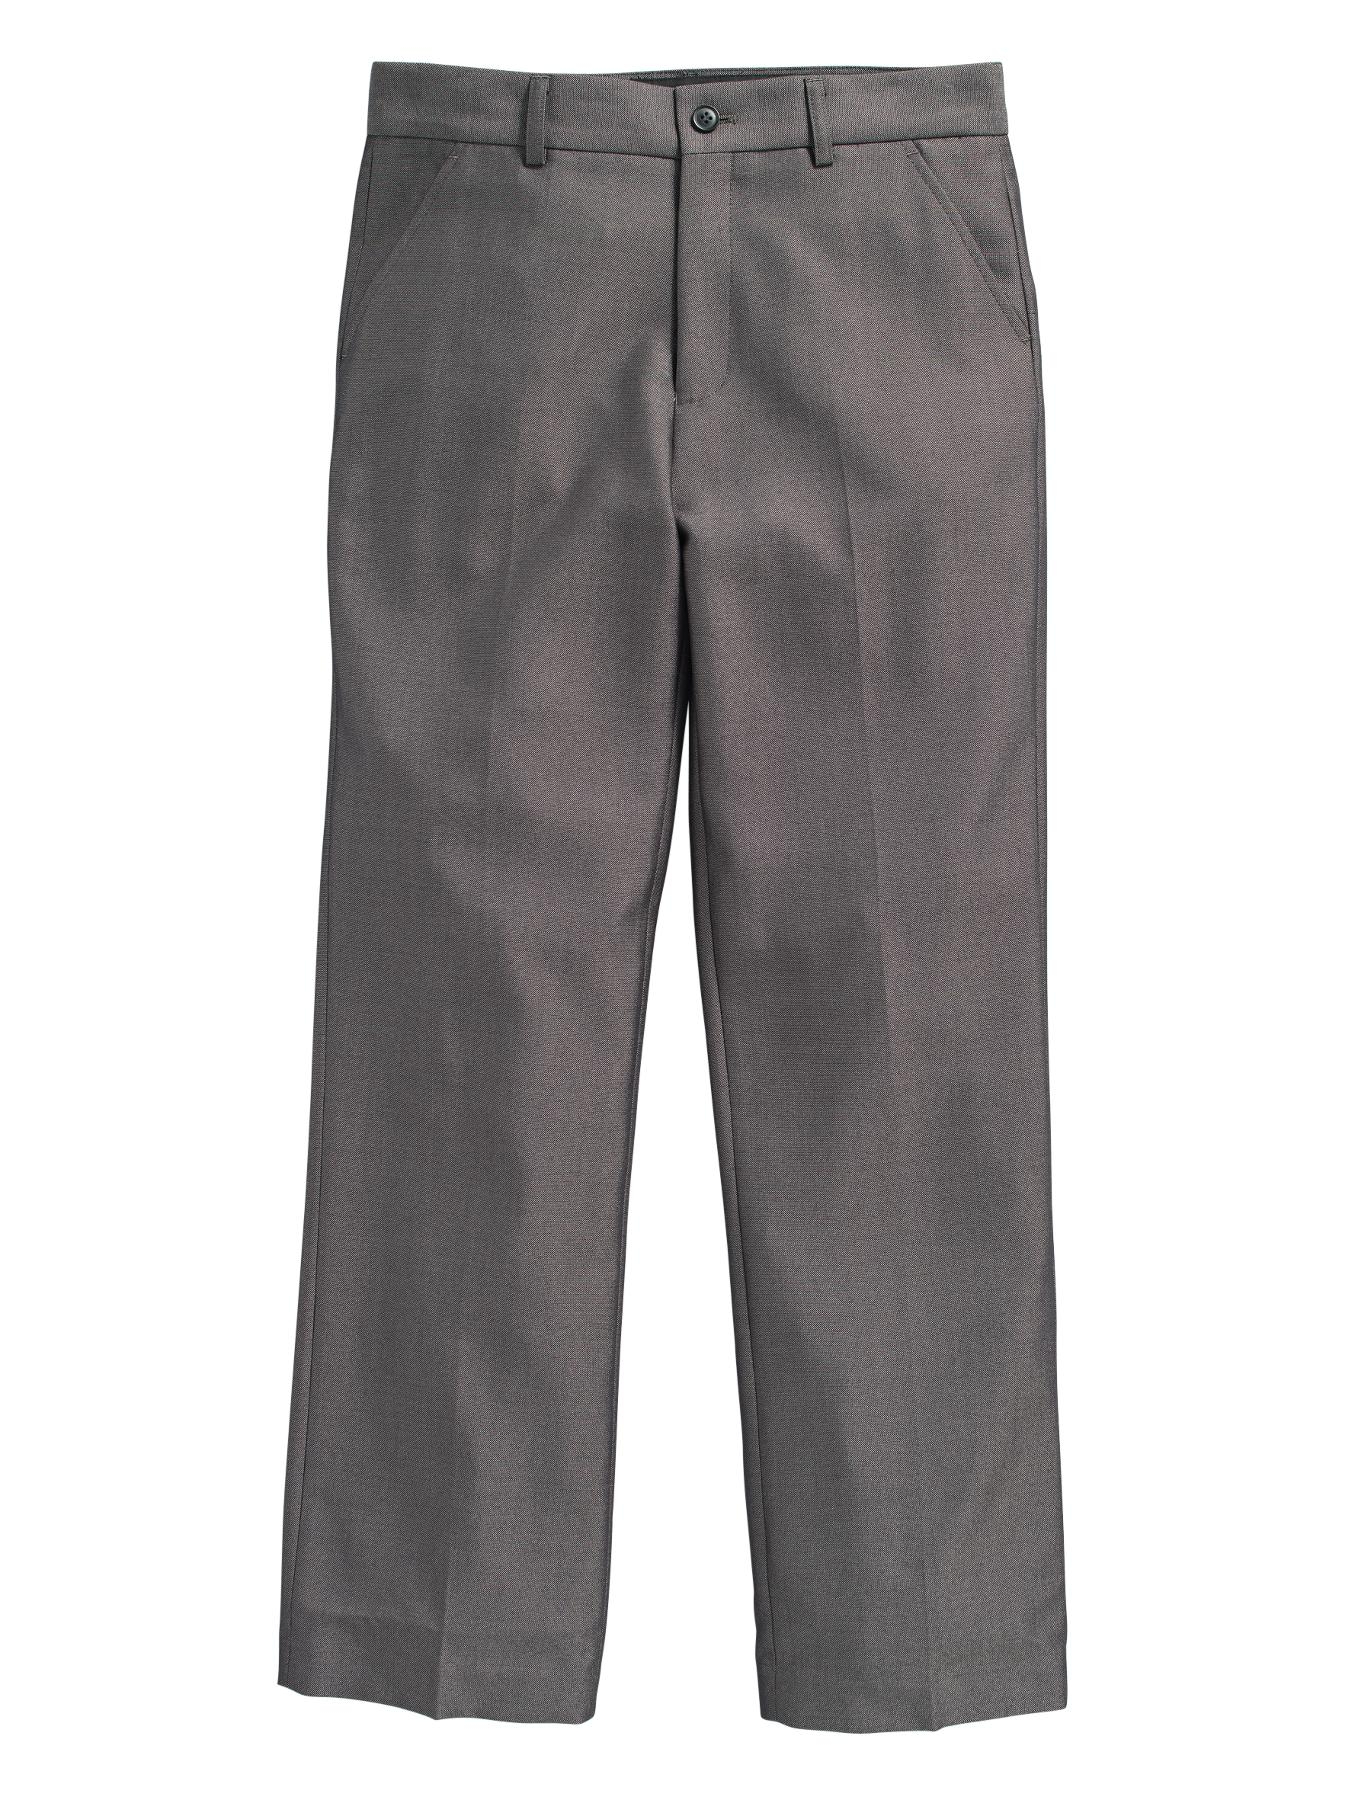 Boys Smart Pleat Front Suit Trousers, Navy,Black,Grey